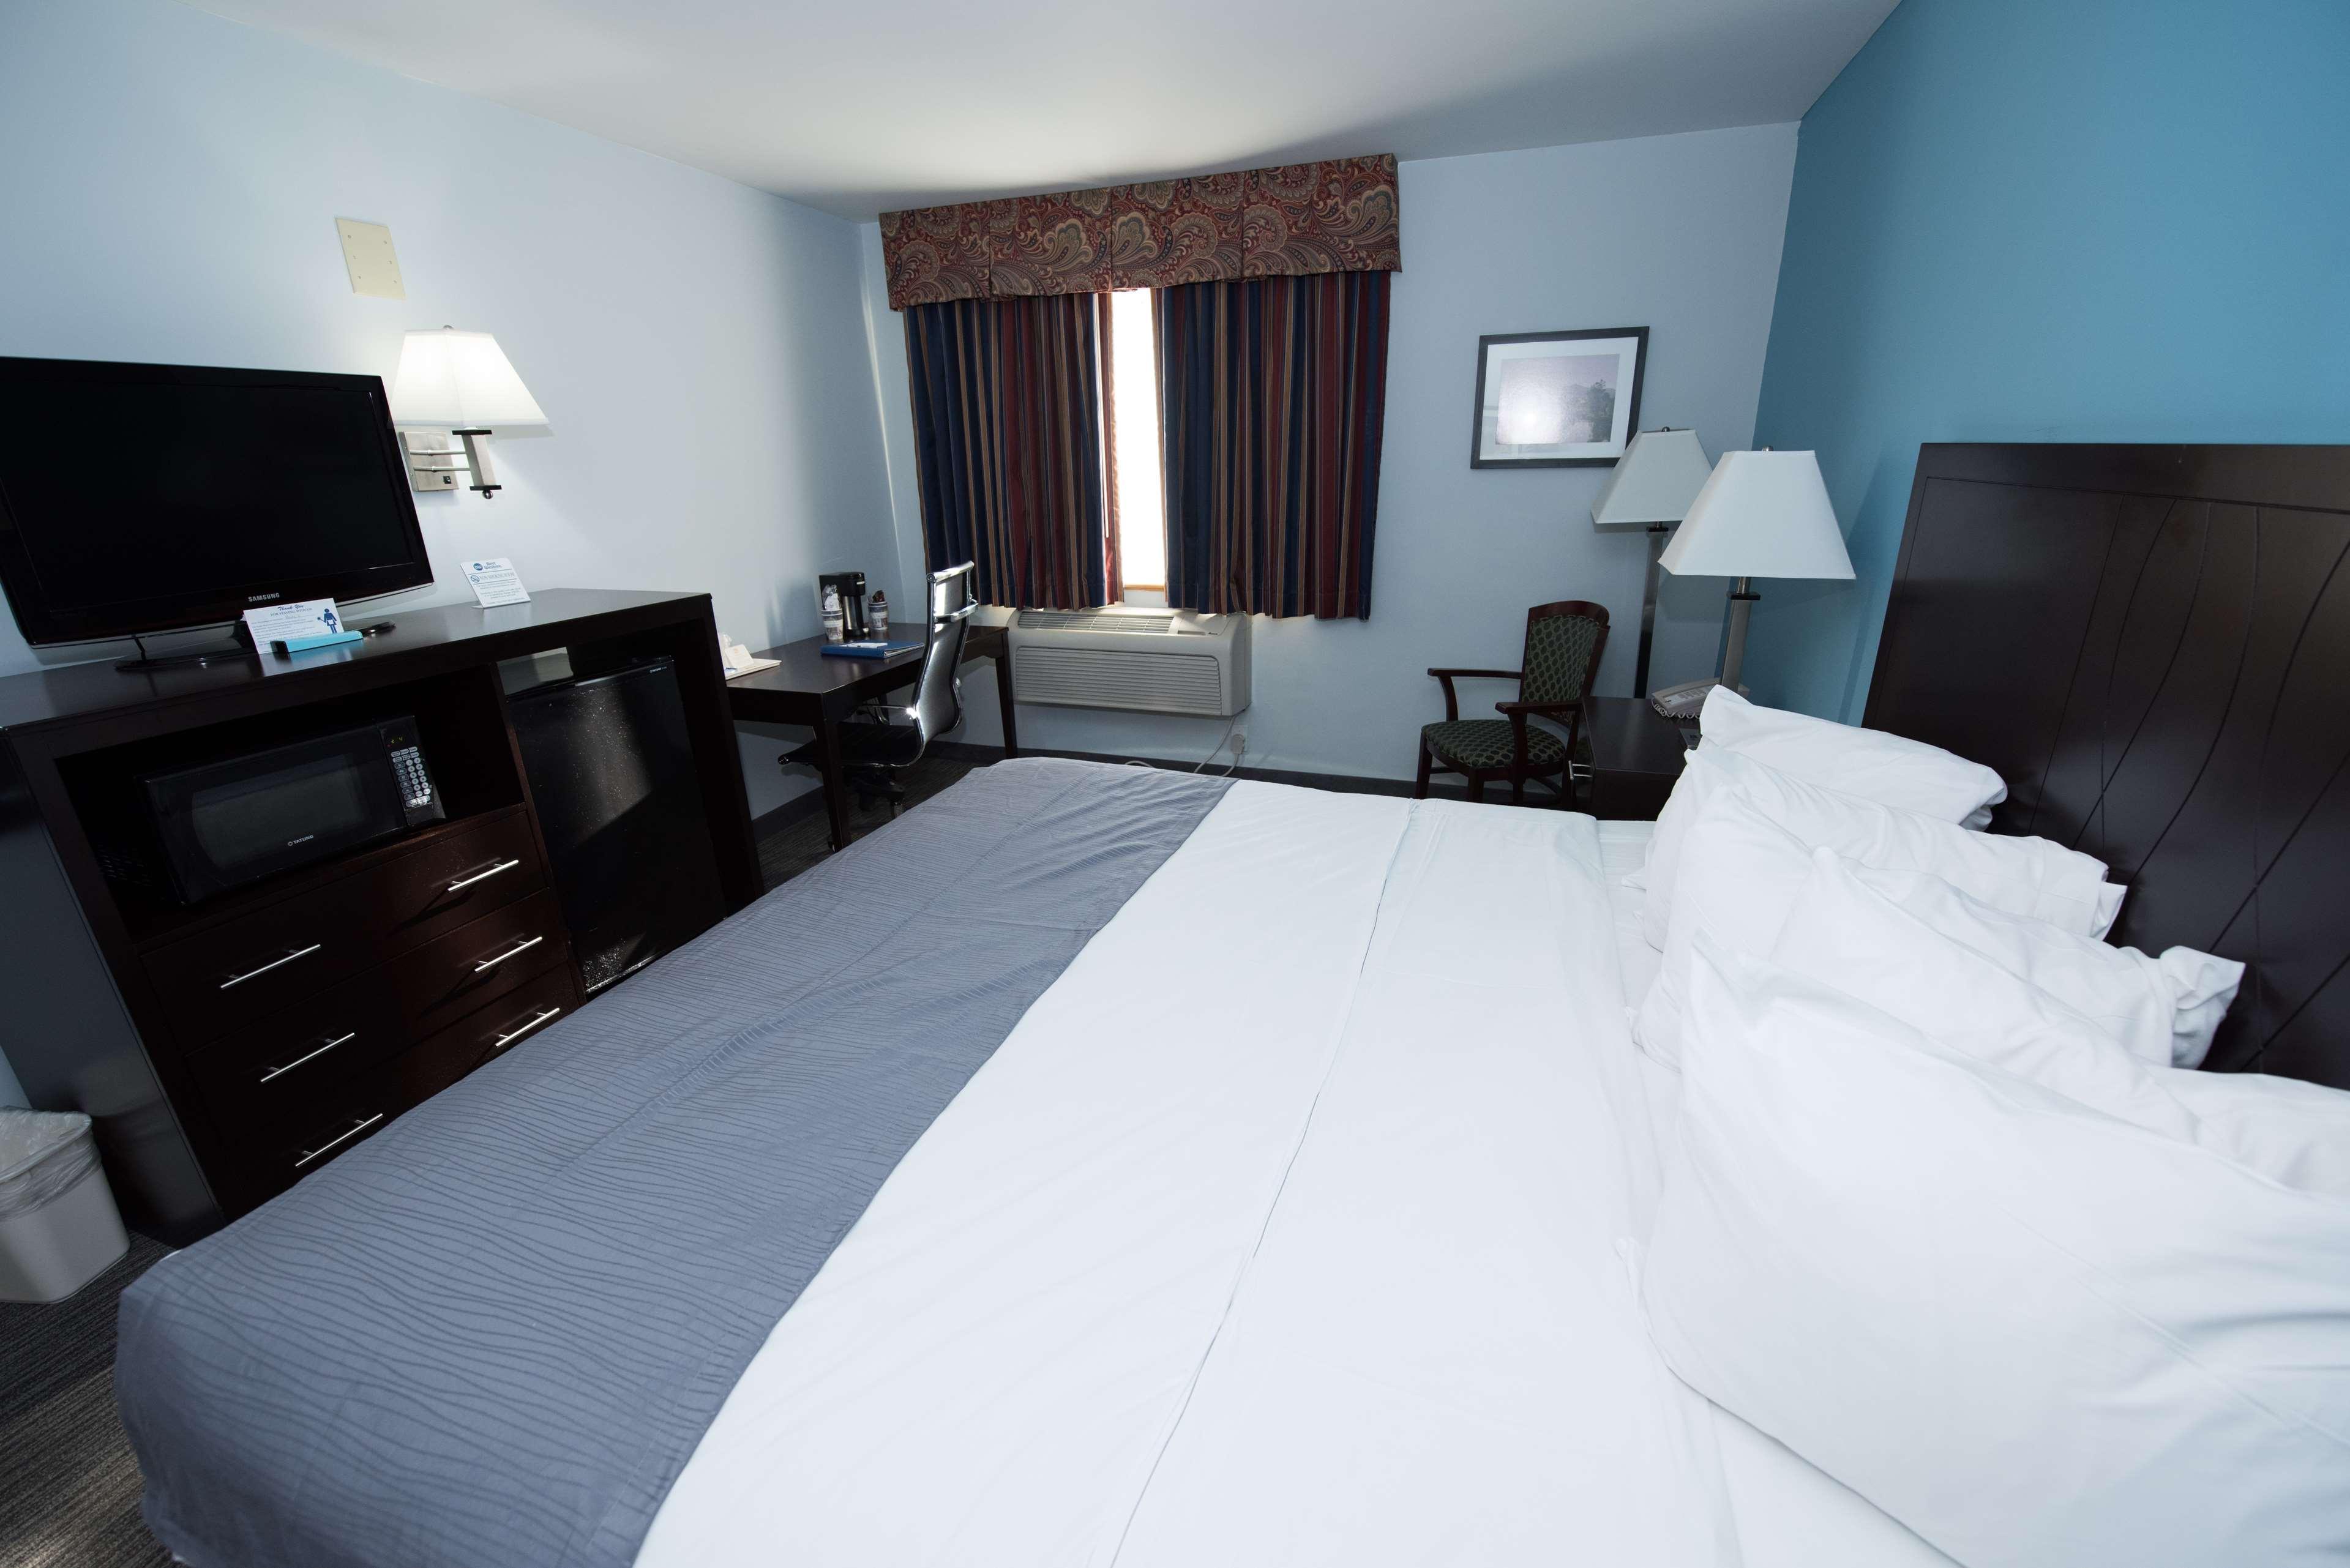 Best Western New Baltimore Inn image 20